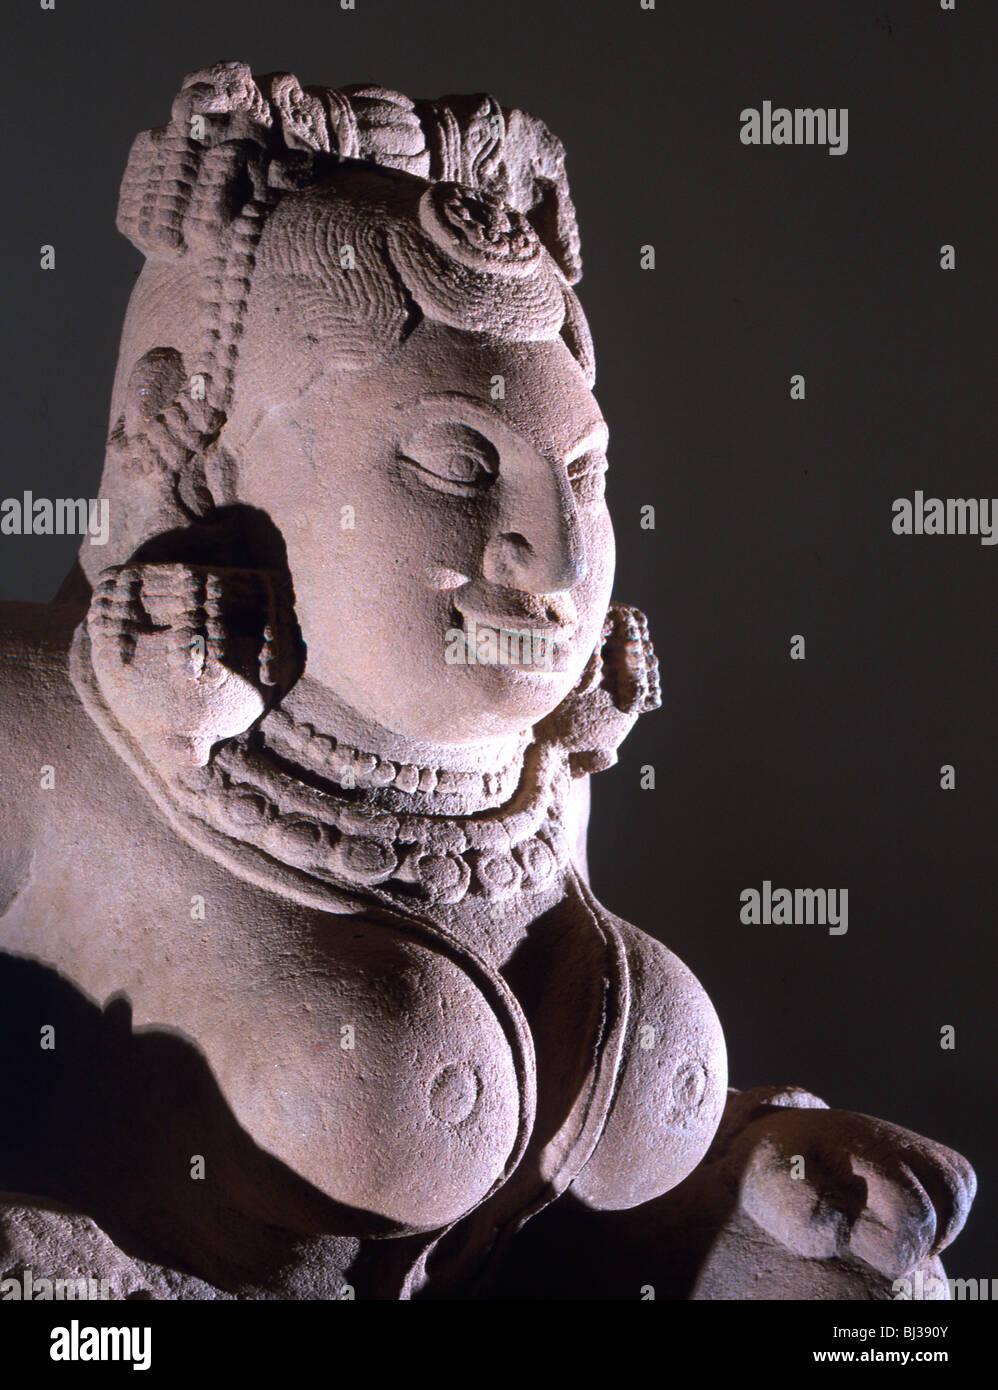 Stone sculpture of a creation goddess, Mauryan, India, 2nd century BC. Artist: Werner Forman - Stock Image